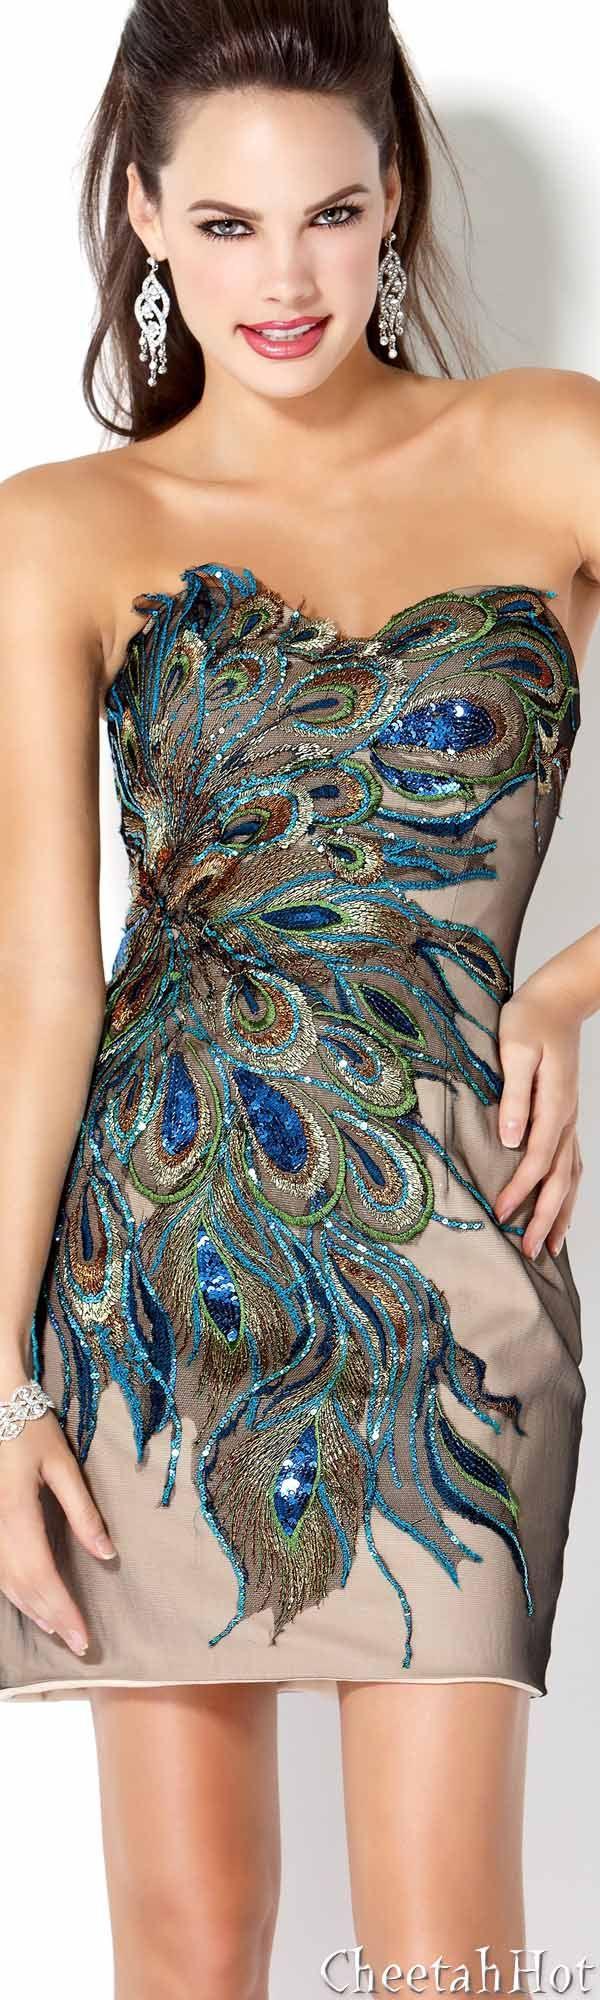 JOVANI - Peacock Design hope Karla Gonzalez likes this dress.